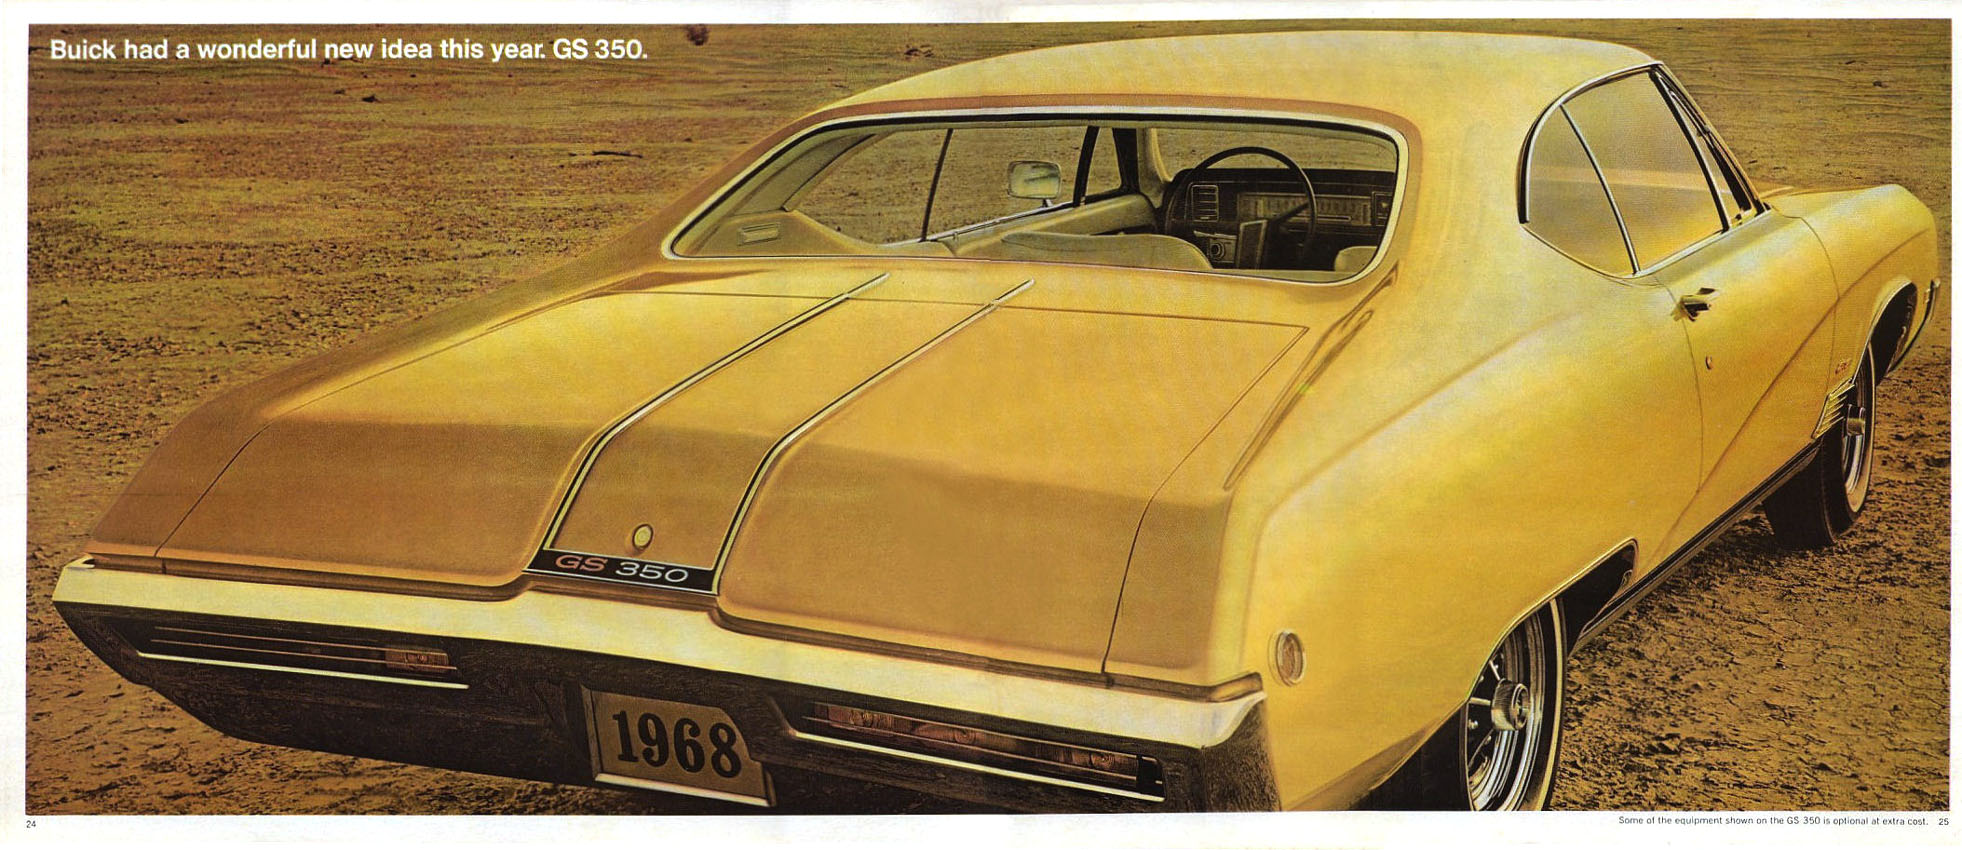 TunnelRam_Buick (62).jpg